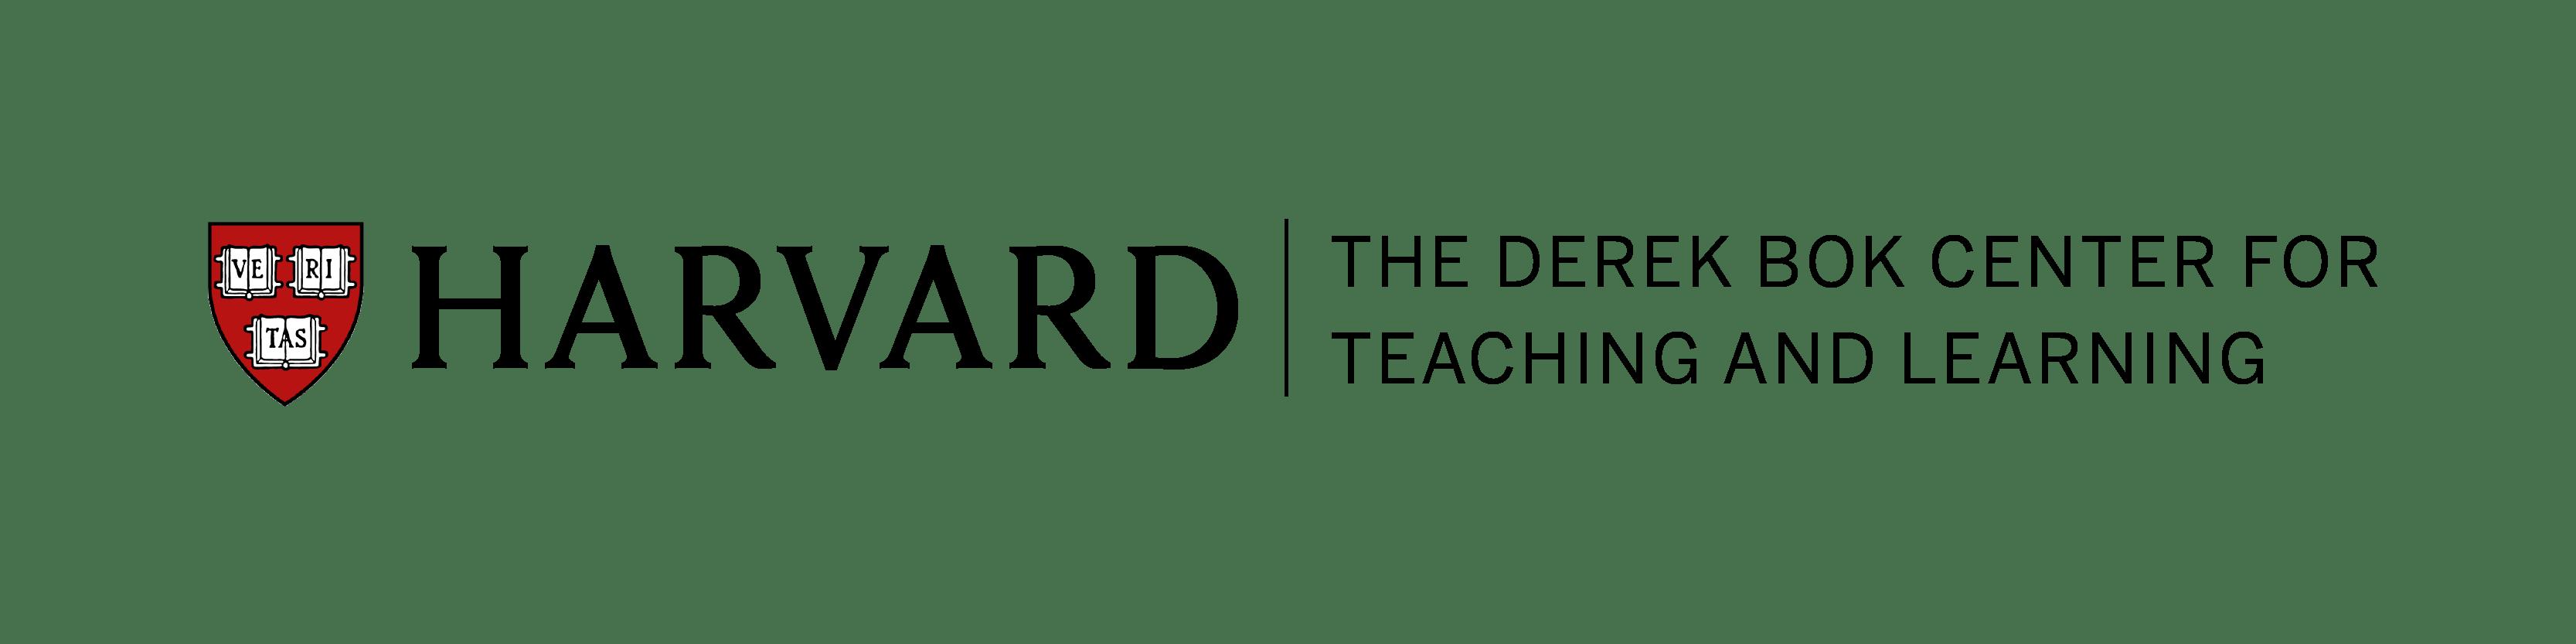 023 Bok Logo Harvard Left Shield Black Original 1 Why Do You Want To Teacher Essay Impressive Be A Pdf Become An English Home Based Online Full